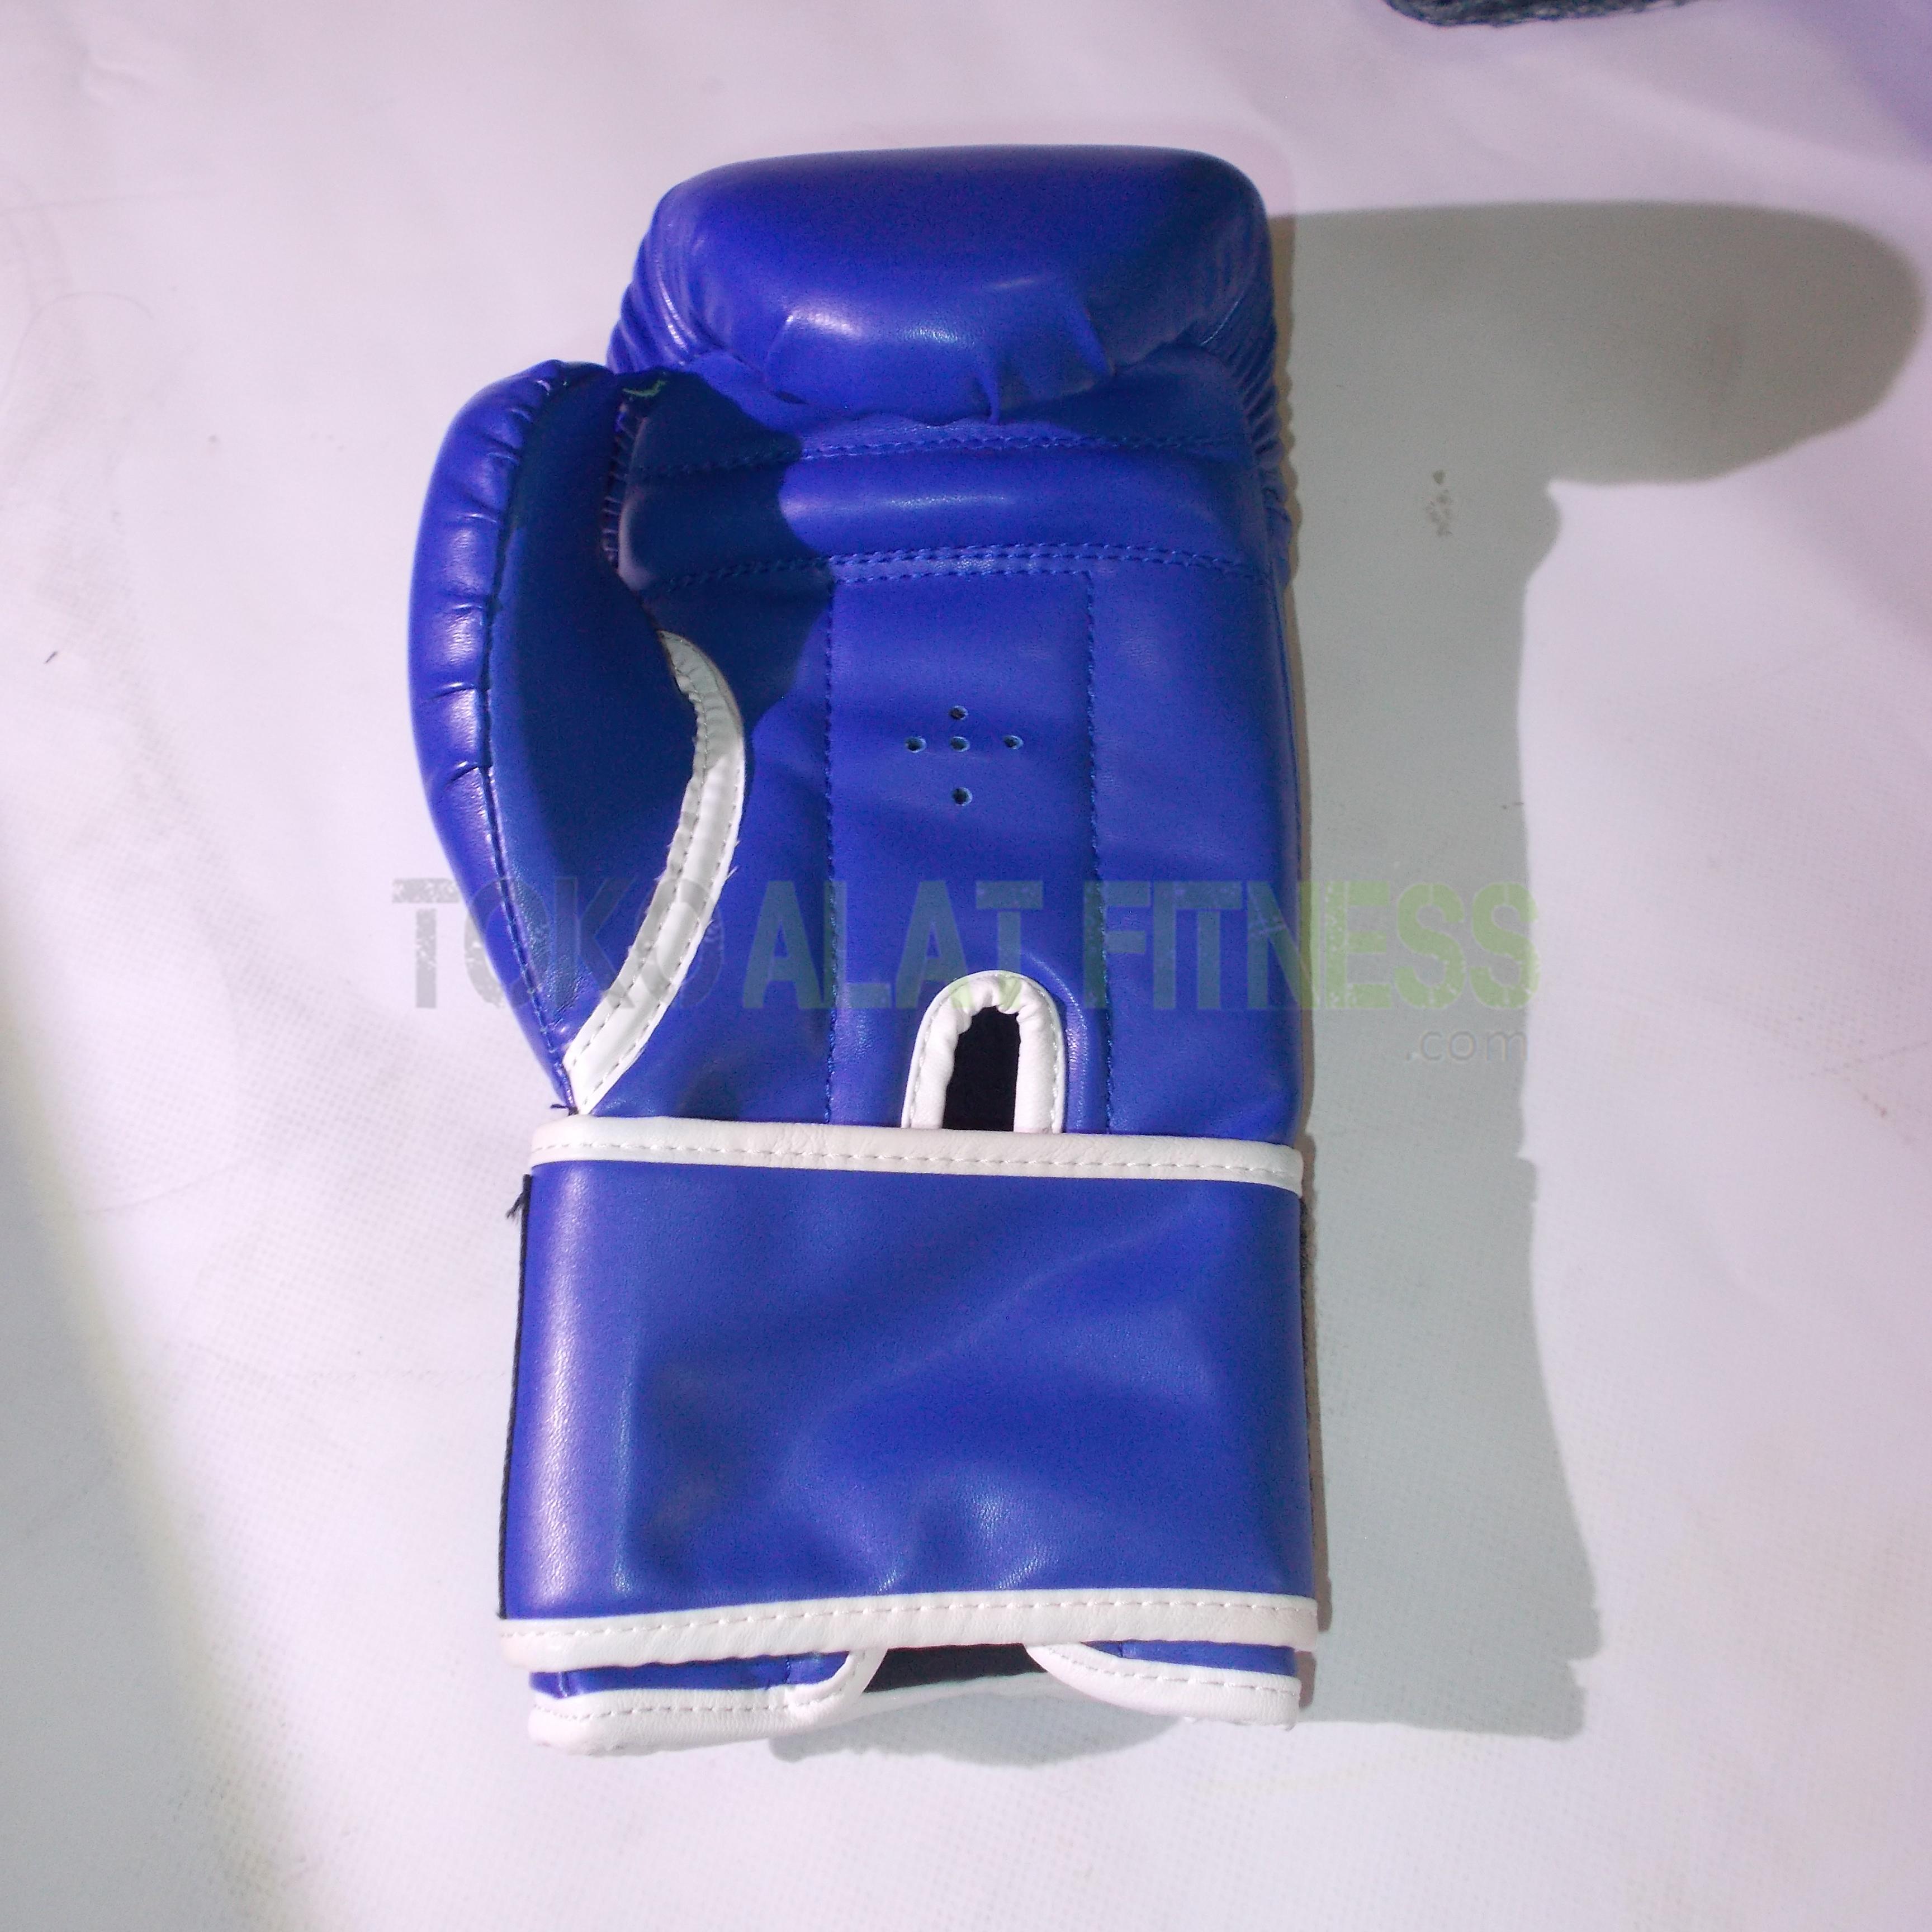 Sarung tinju everlast biru new 3 - Sarung Tinju/Boxing Glove 10 OZ (biru) Everlast